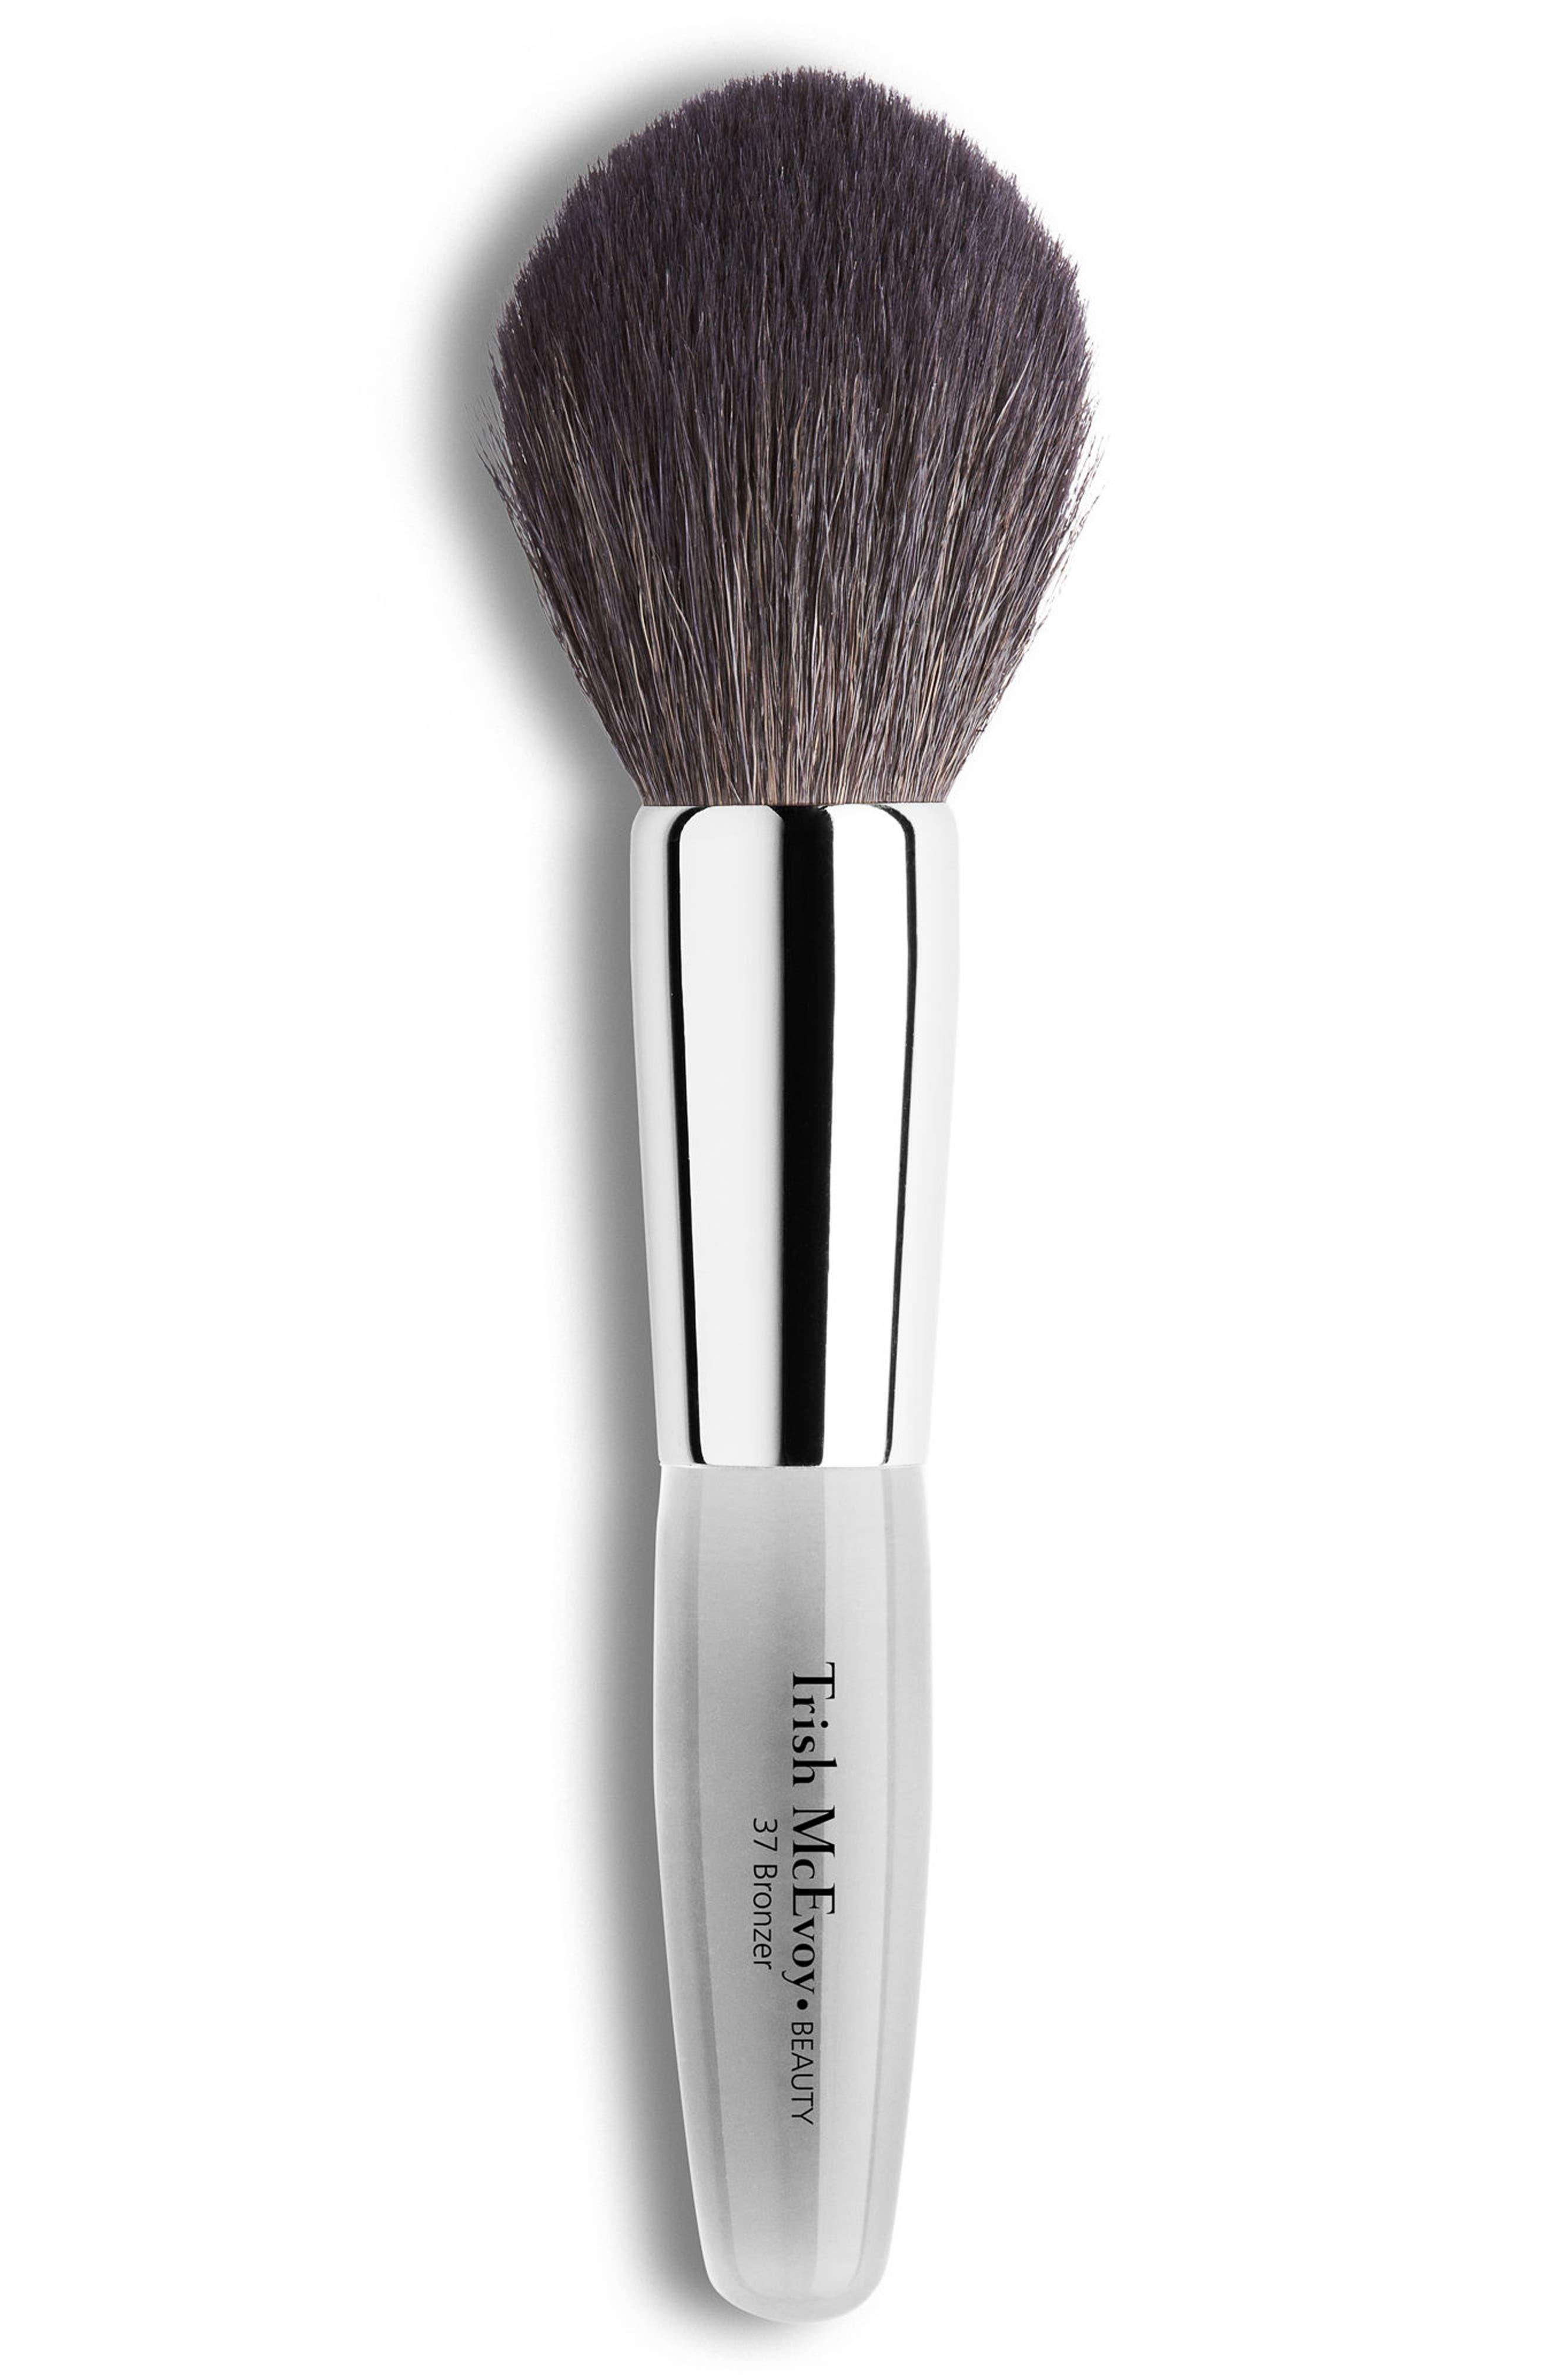 #37 Bronzer Brush,                         Main,                         color, No Color